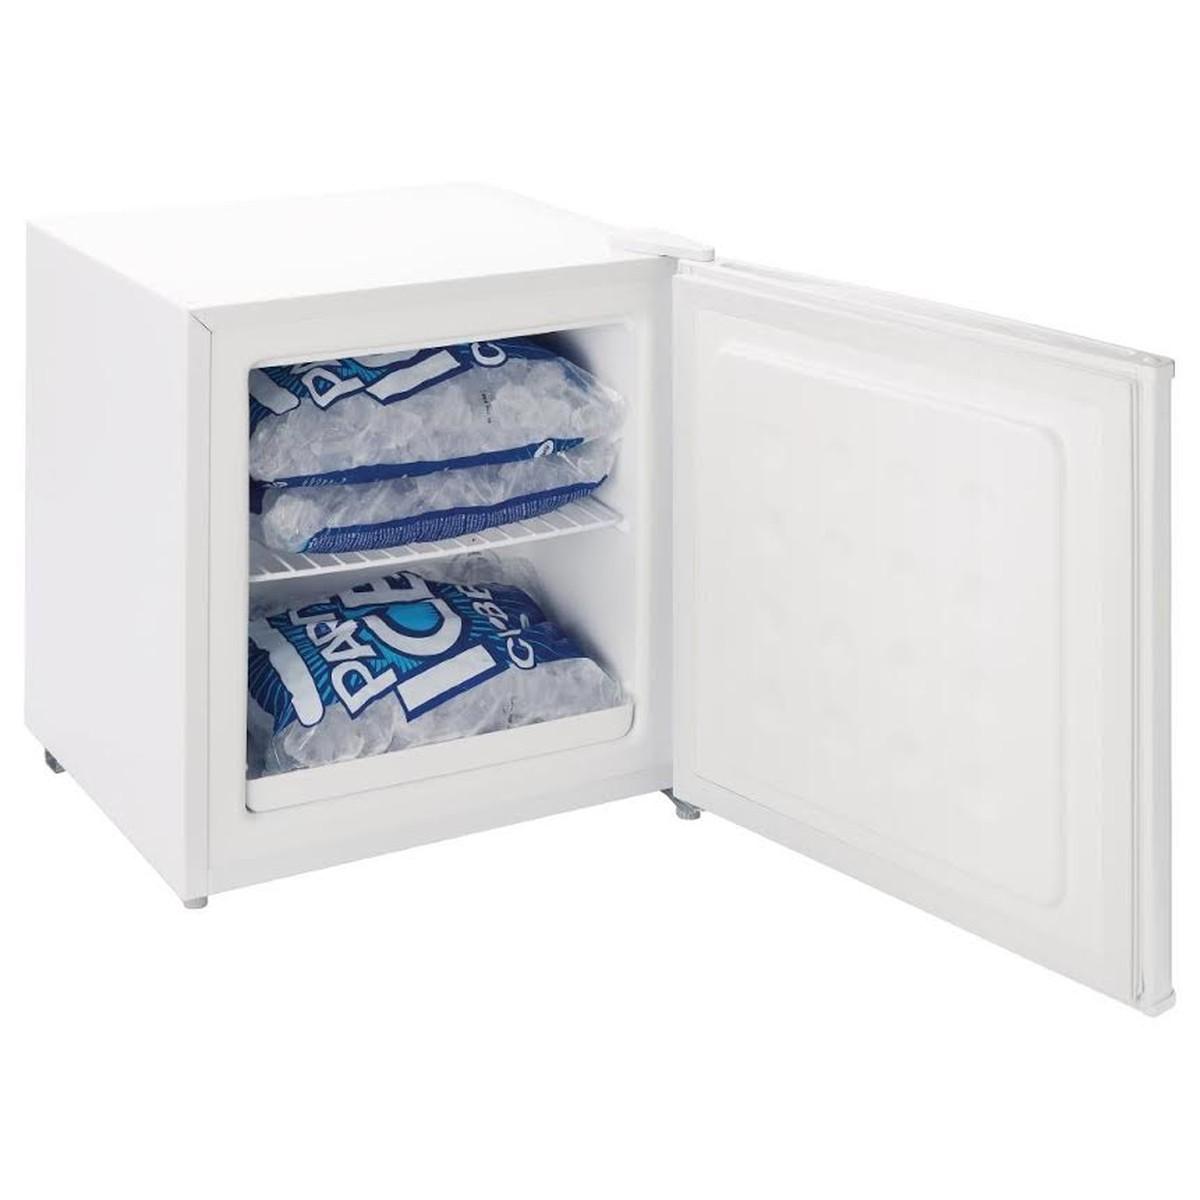 Secondhand Catering Equipment Freezers Lec